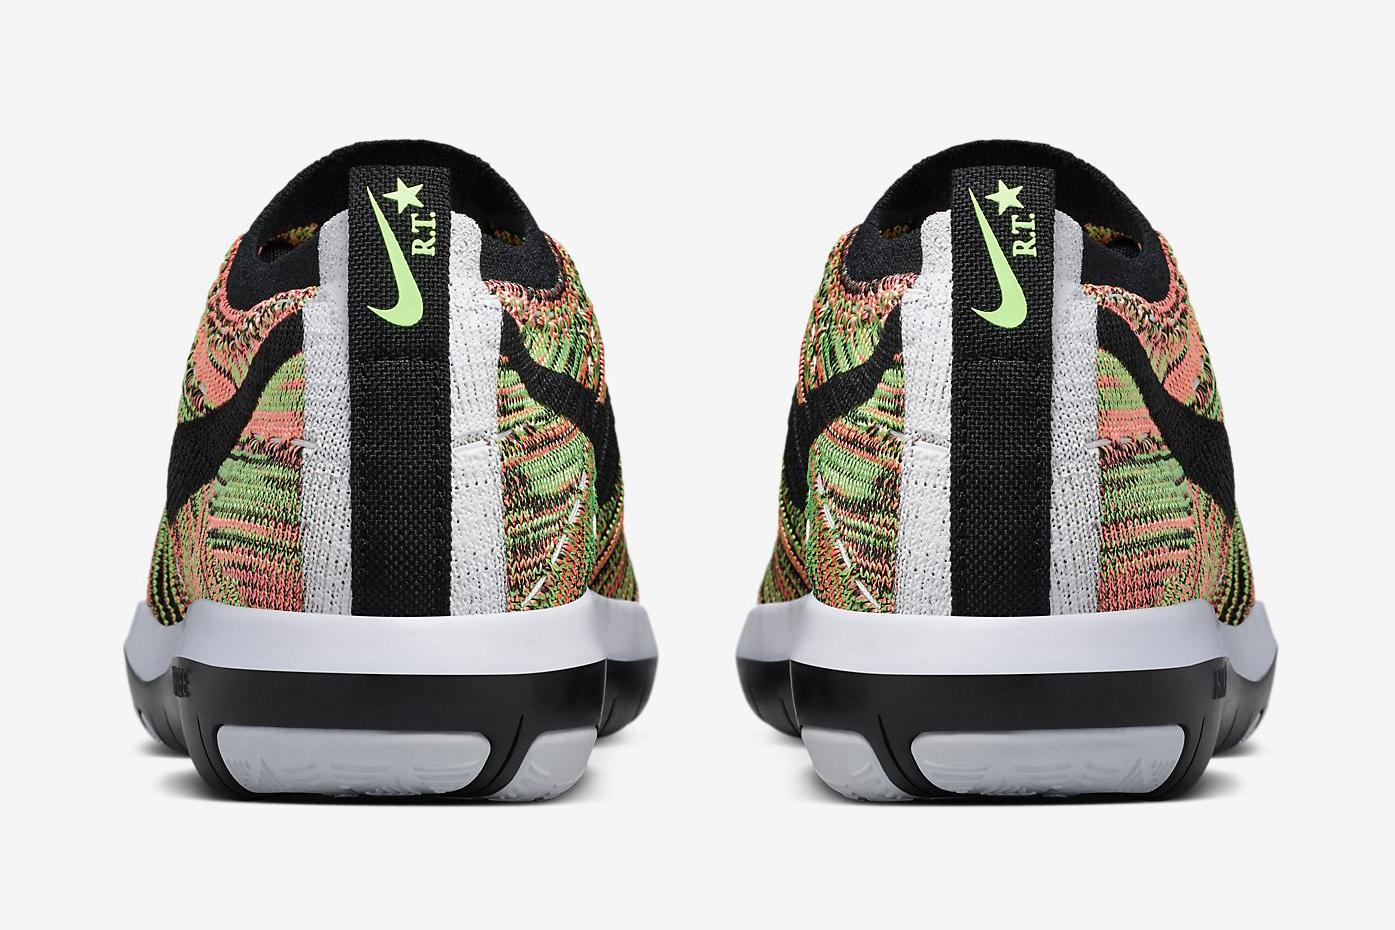 nikelab-riccardo-tisci-multicolor-flyknit-sneakers-10